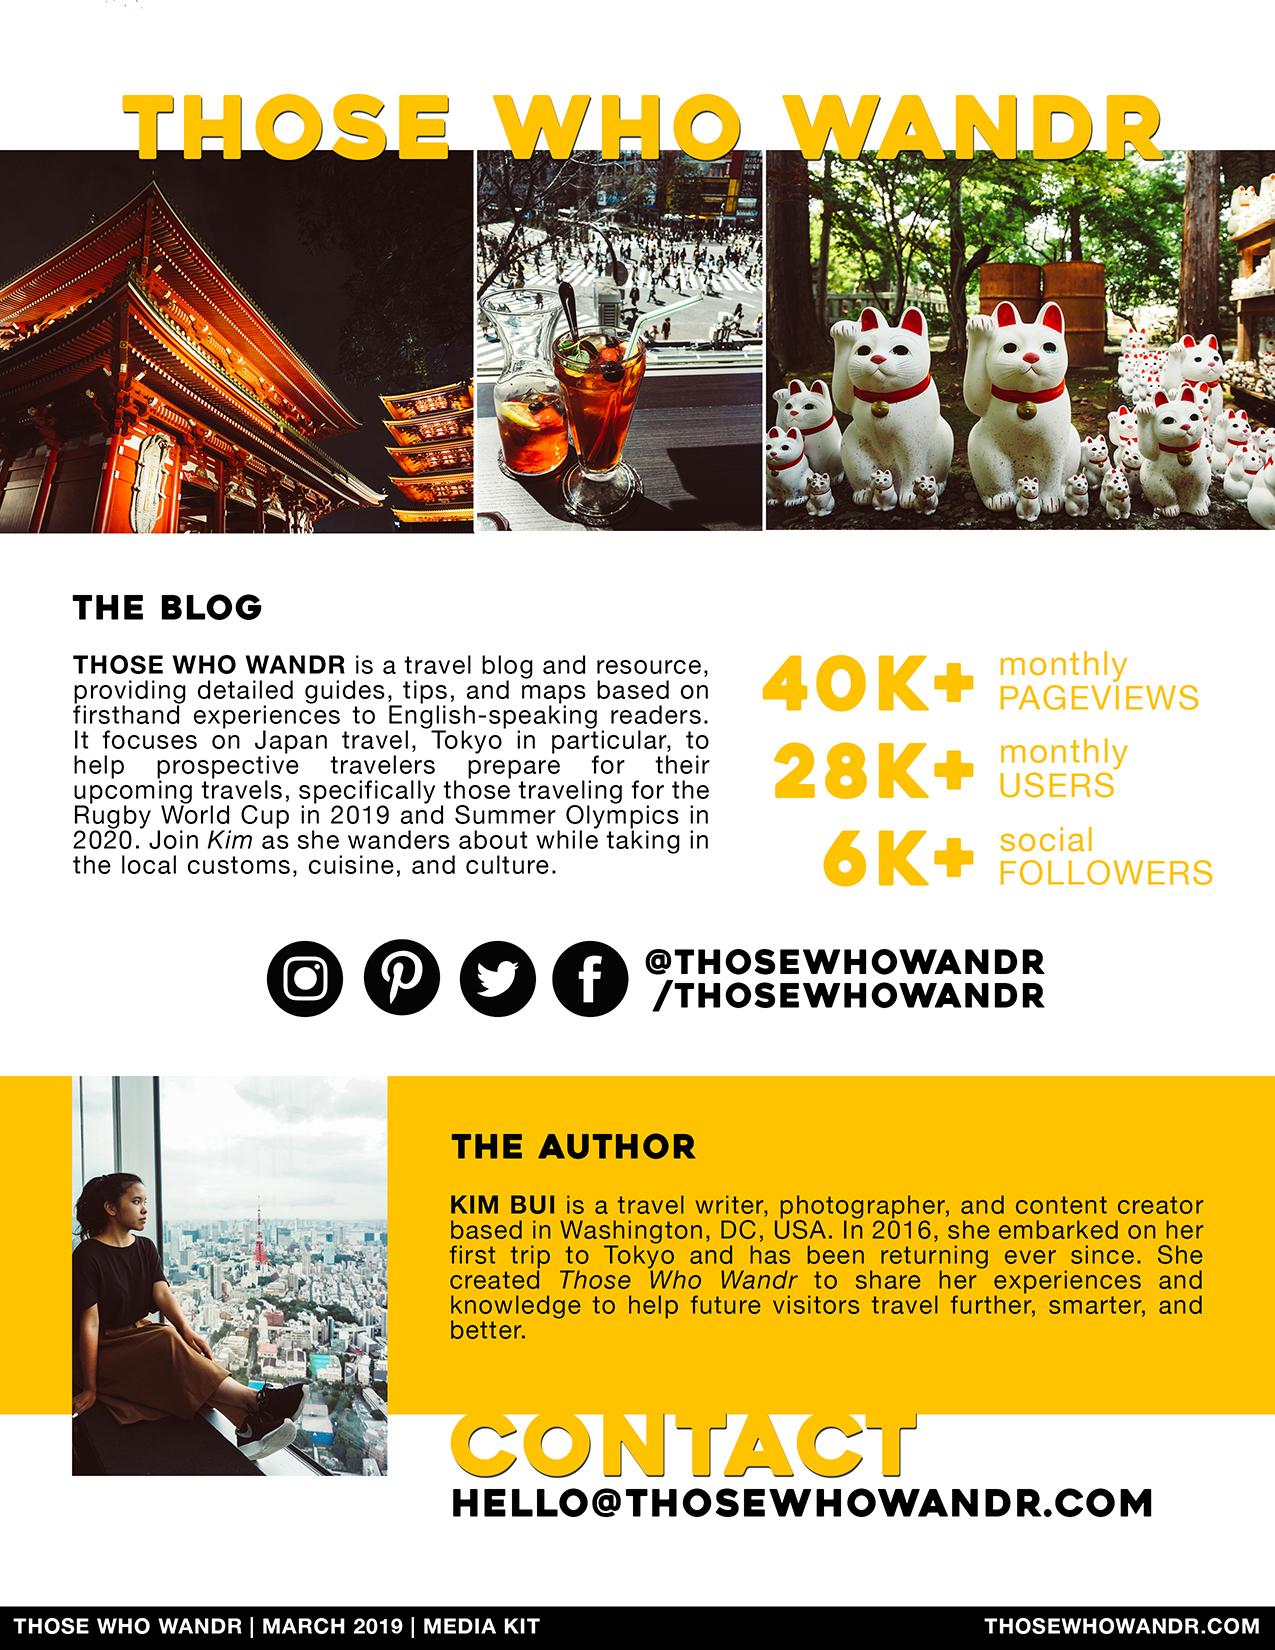 Those Who Wandr - Media Kit.jpg